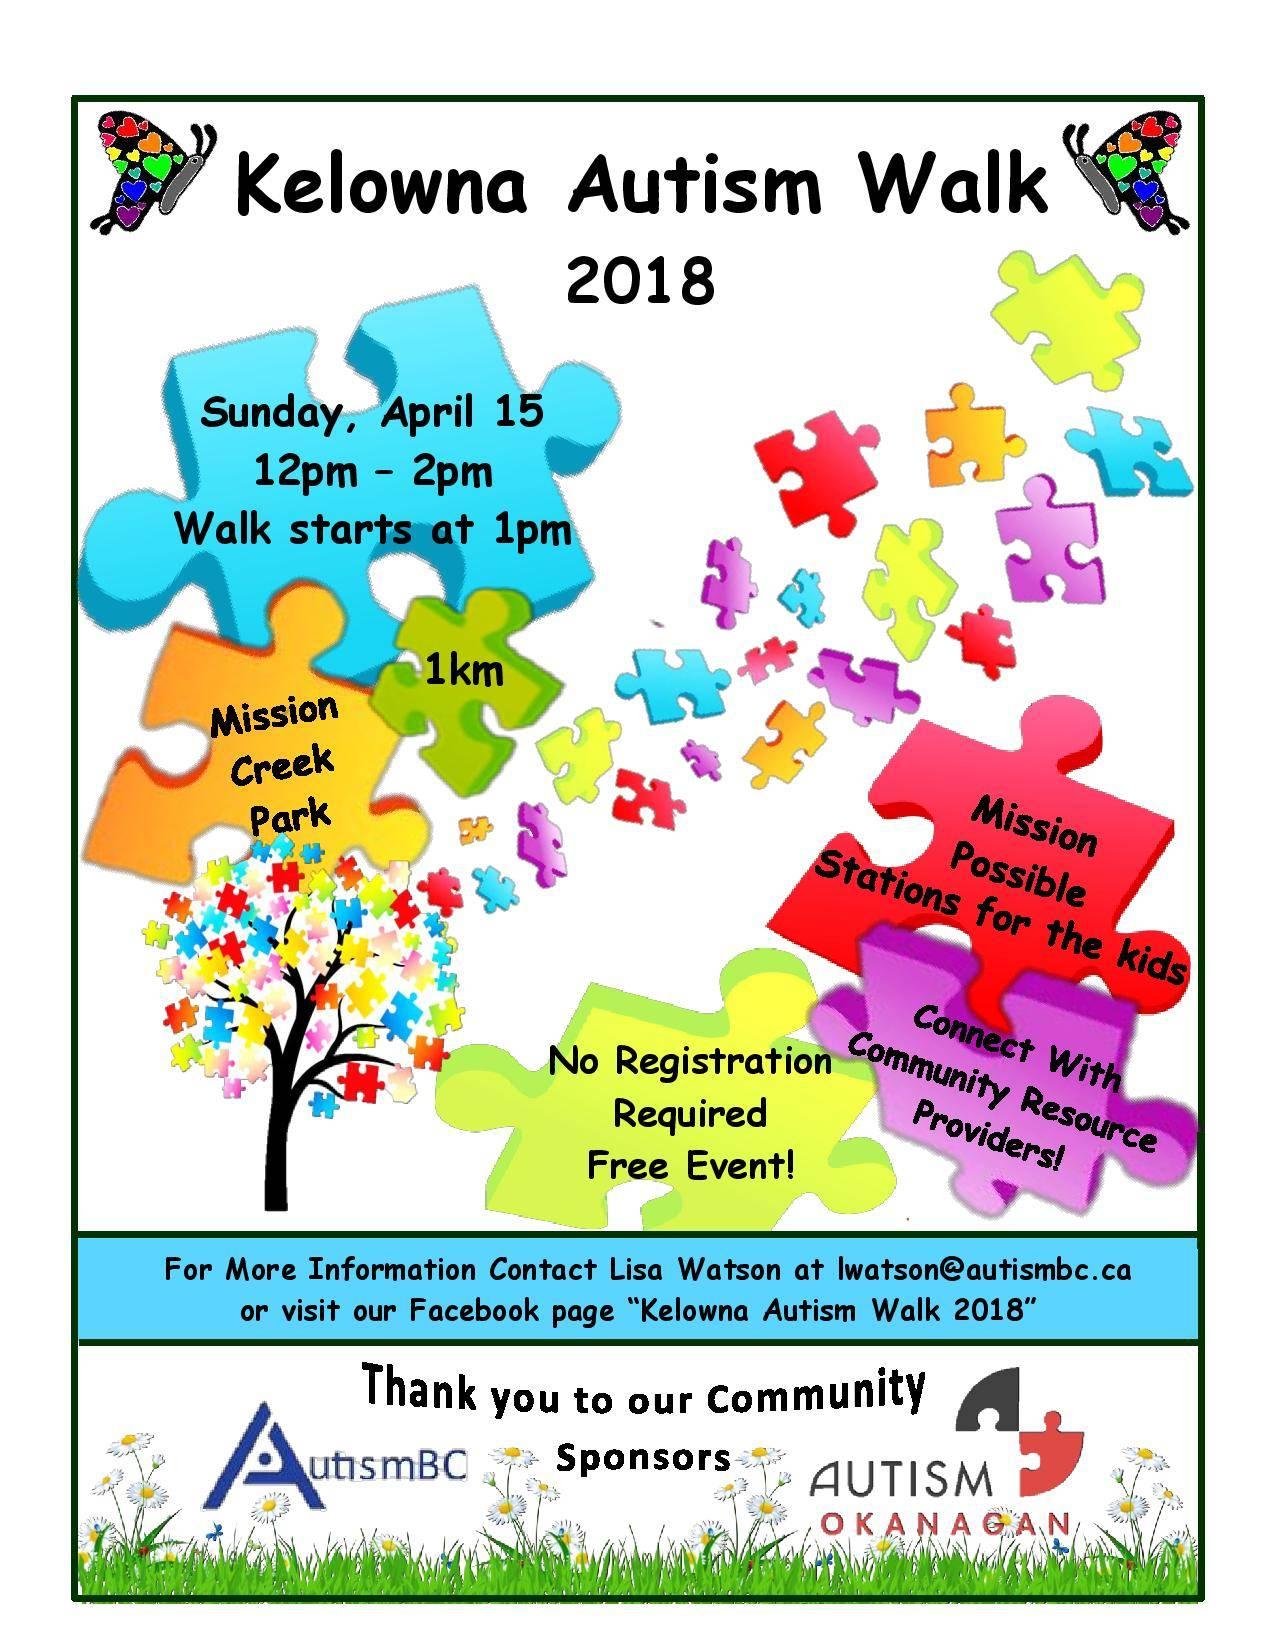 Kelowna Autism Walk 2018